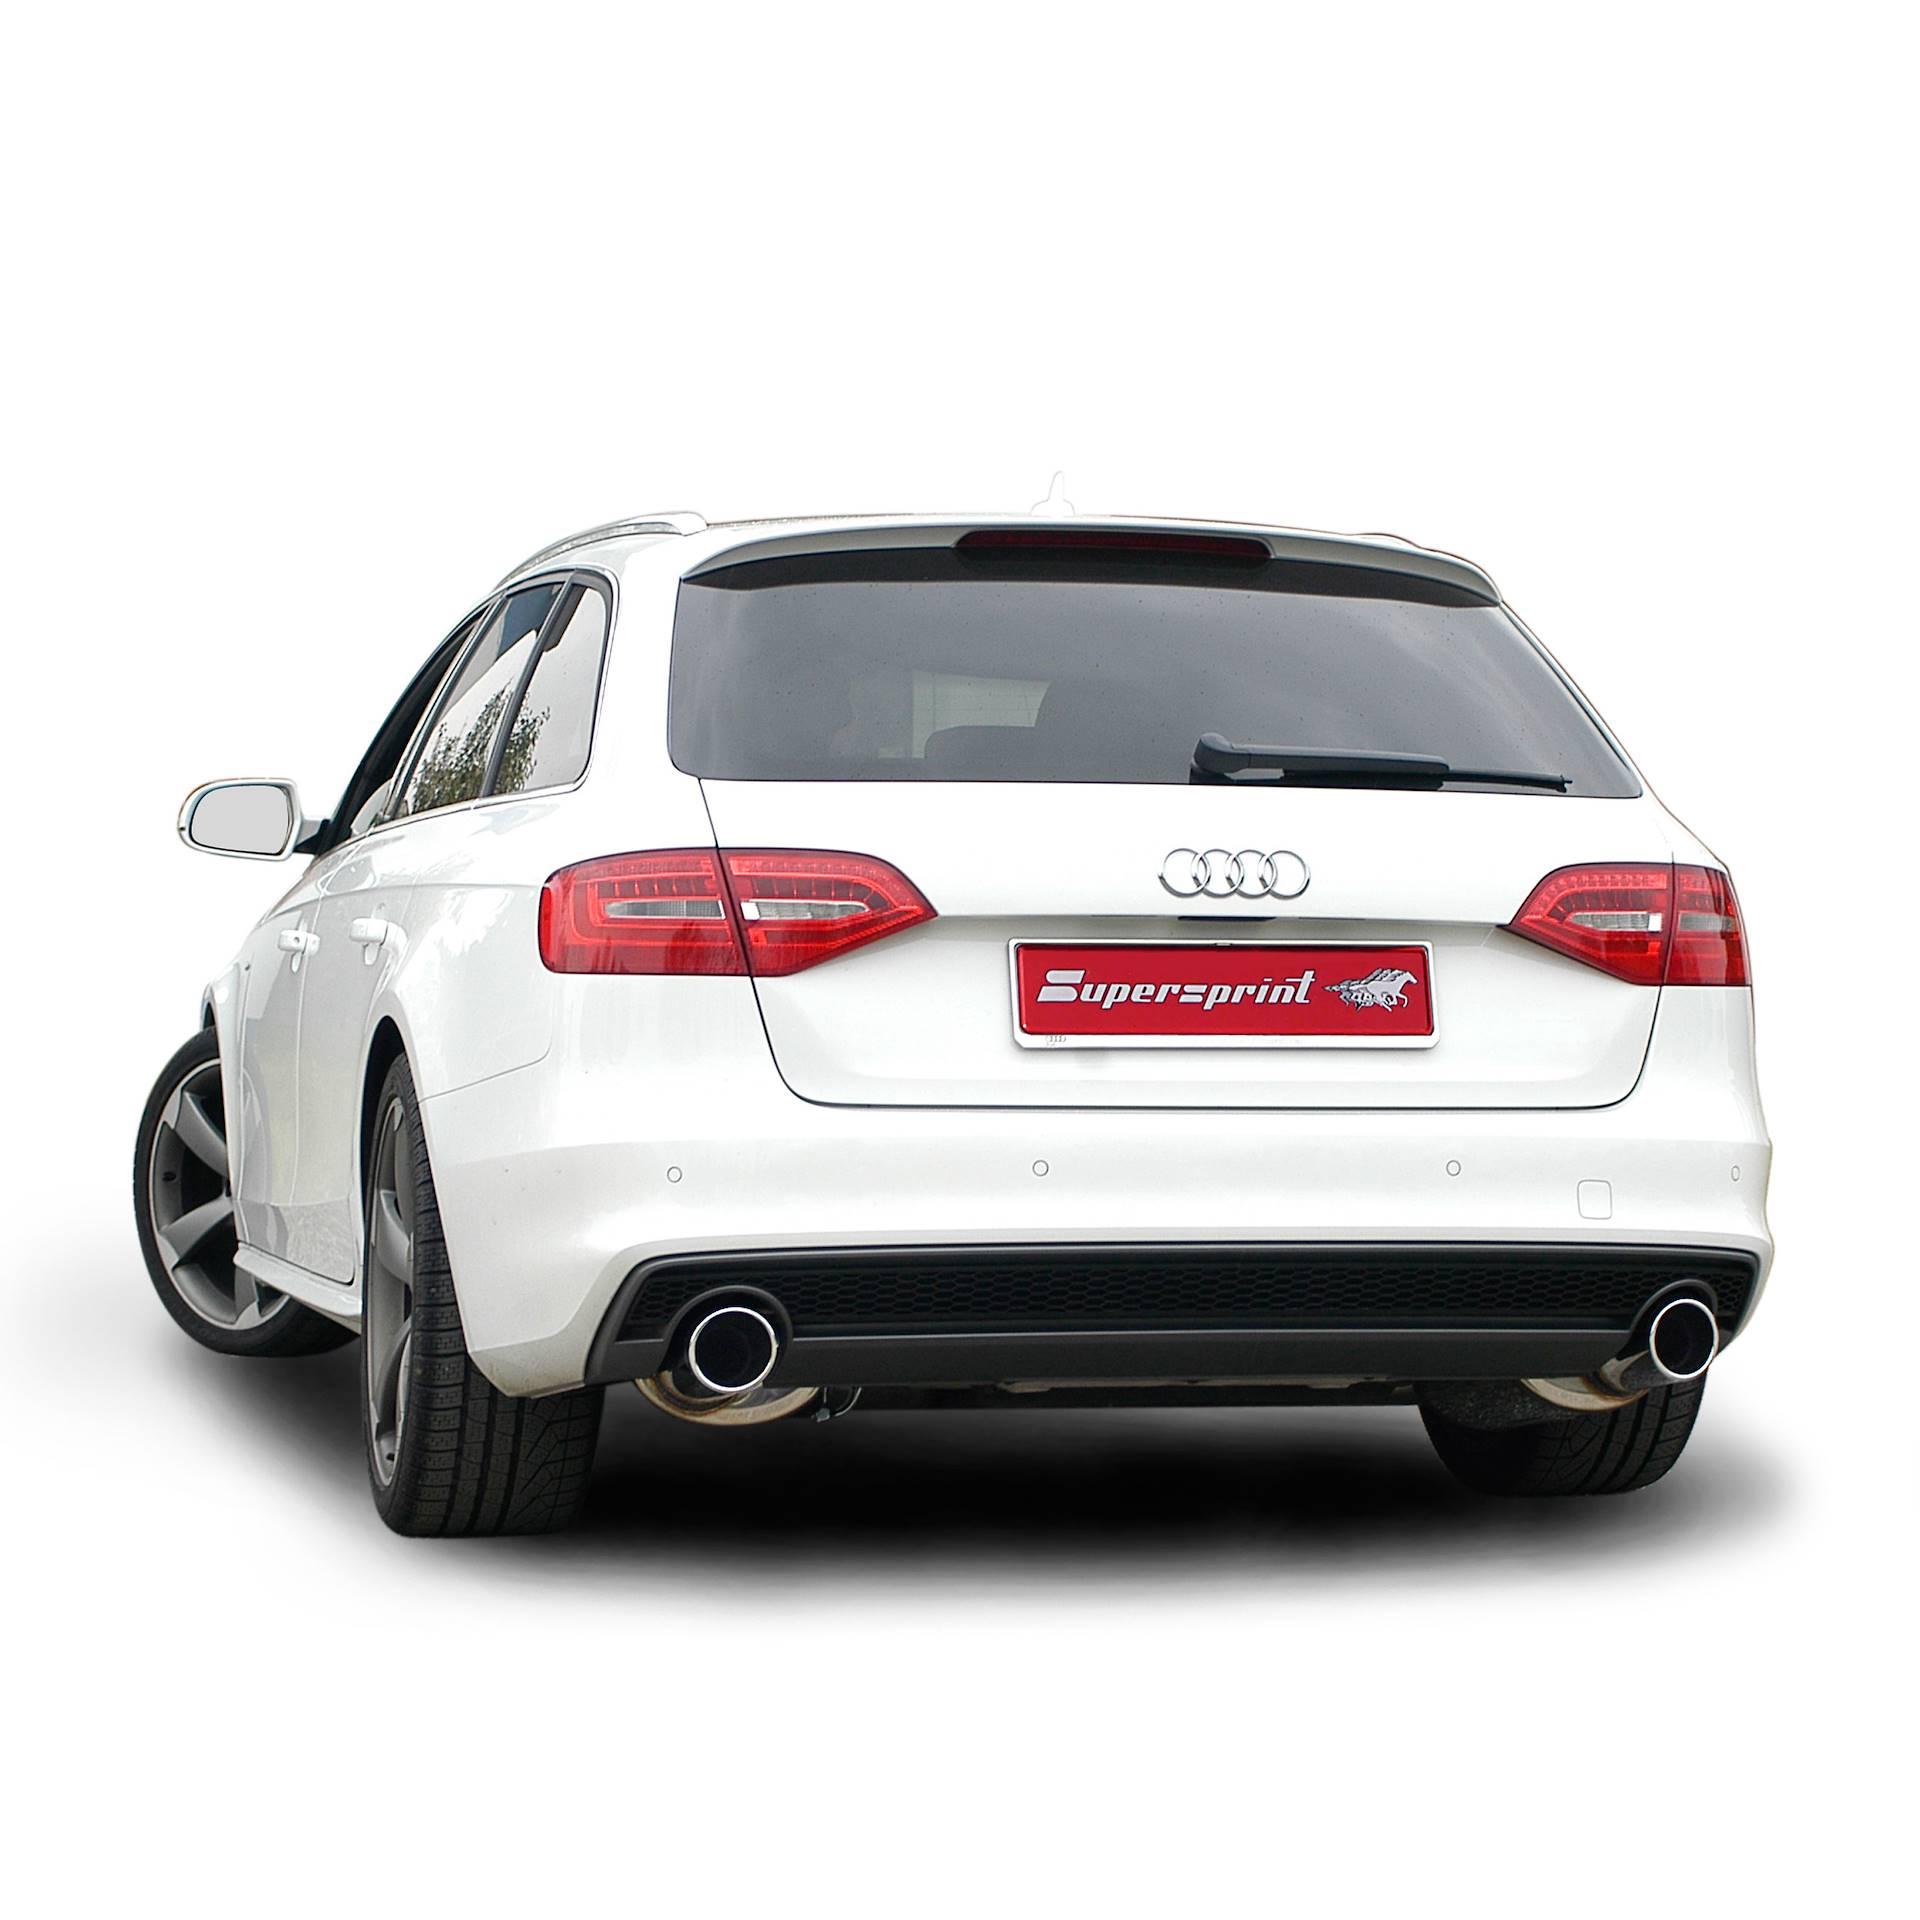 AUDI A5 Coupè/Cabrio 2 0 TFSI -> Supersprint Cat-back system